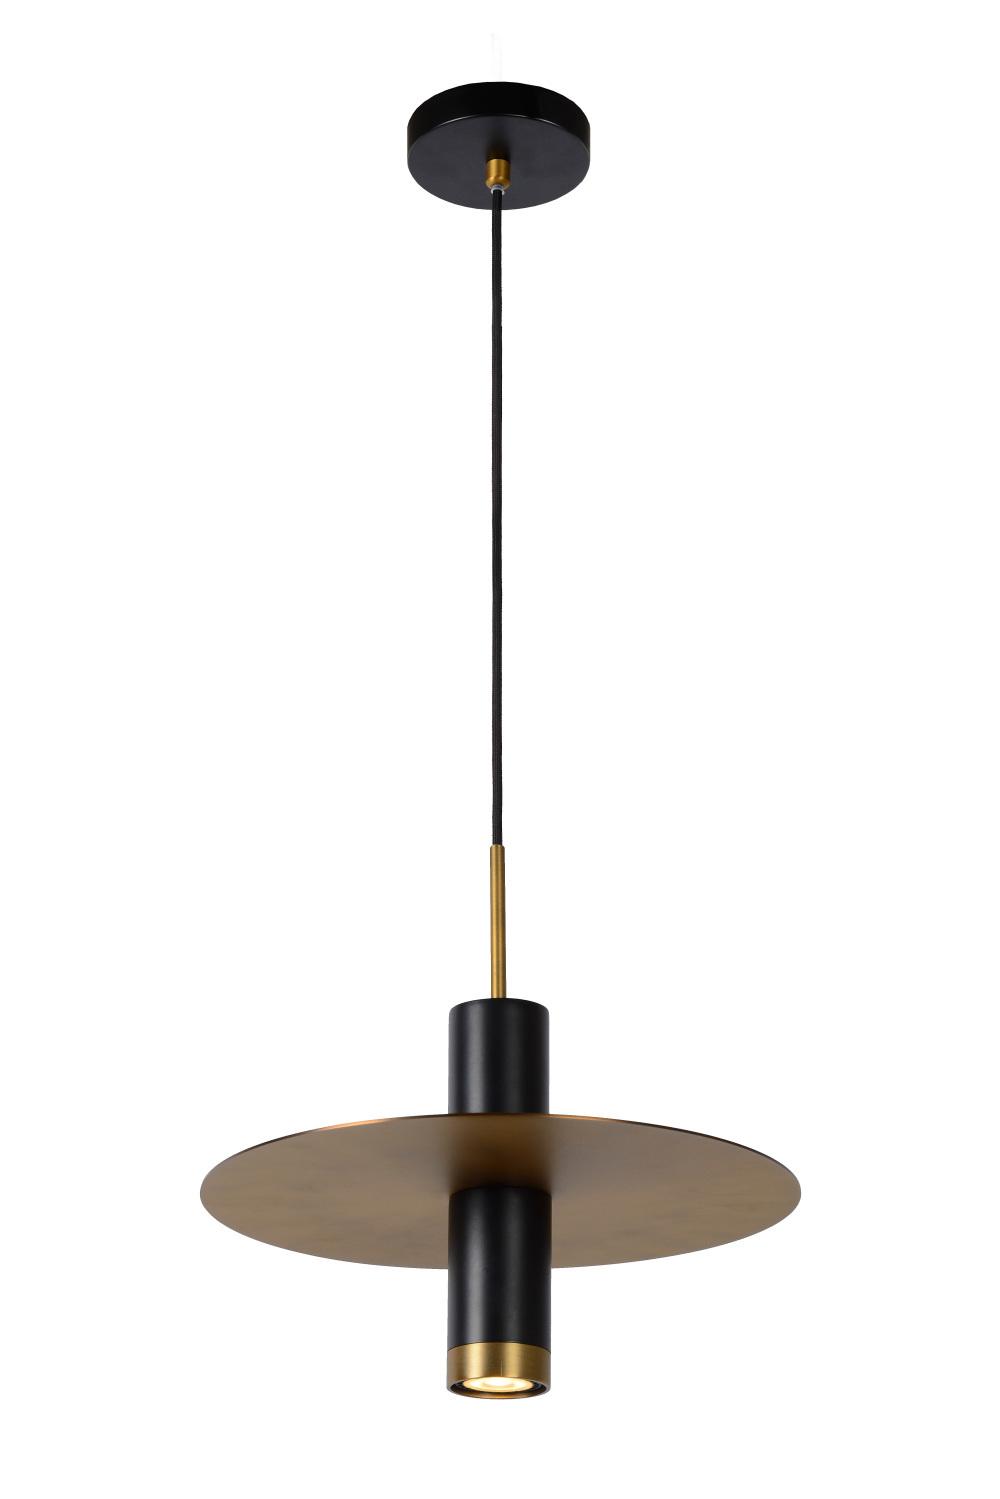 Lucide SELIN Hanglamp-Zwart-Ø35-1xGU10-35W-Metaal